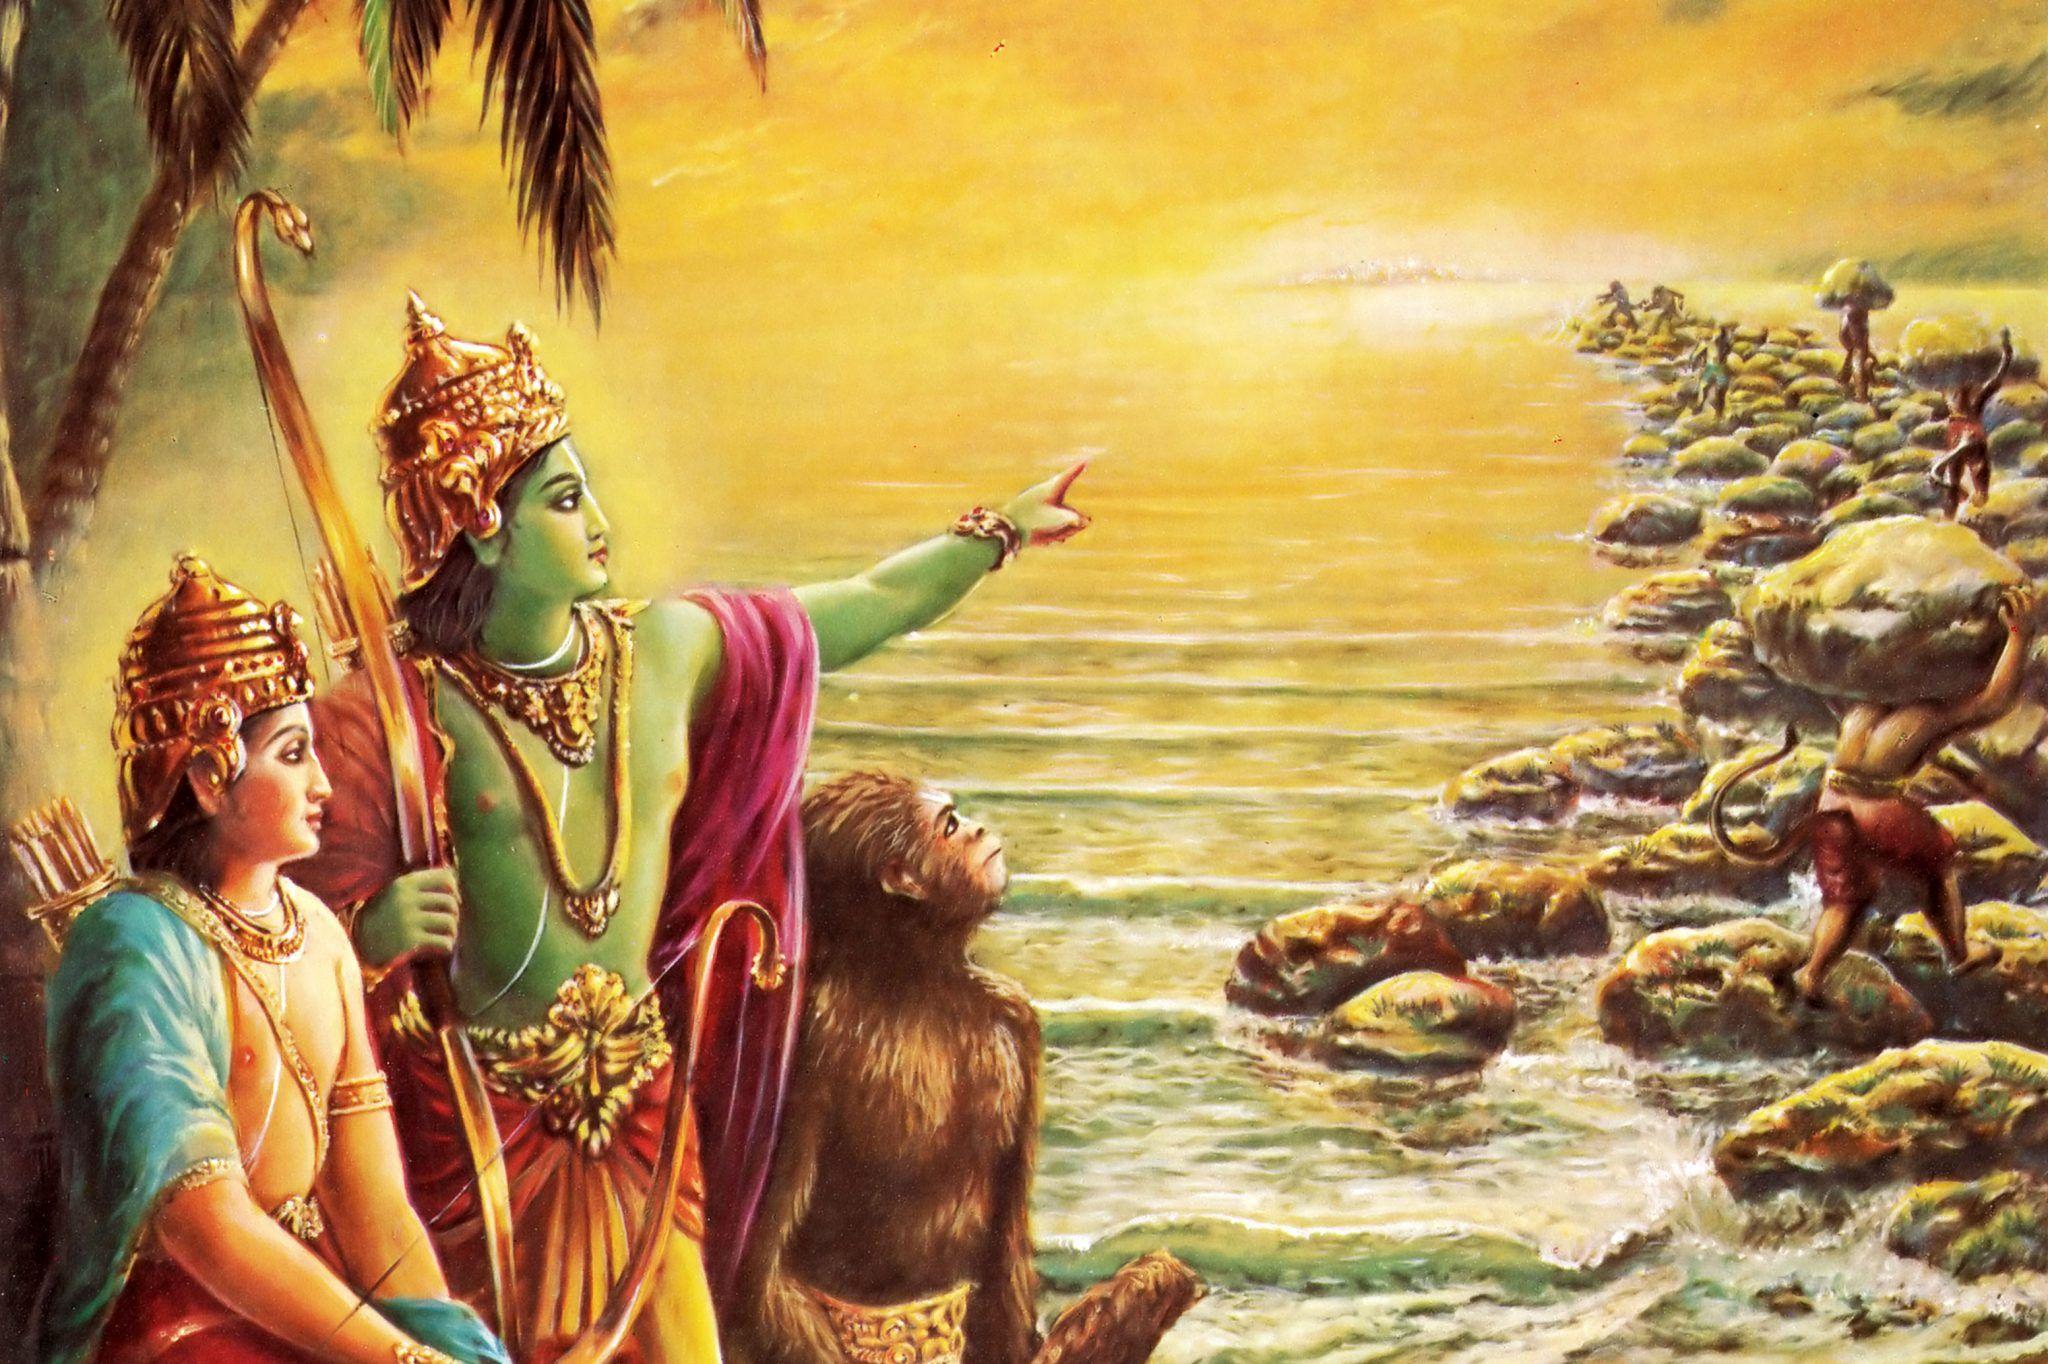 hindu reflection The latest tweets from hinduism reflections (@hindu_here) interesting facts from sanatan dharma ~ true aryan kshatriya (satvat dharma hindu) swarglok.